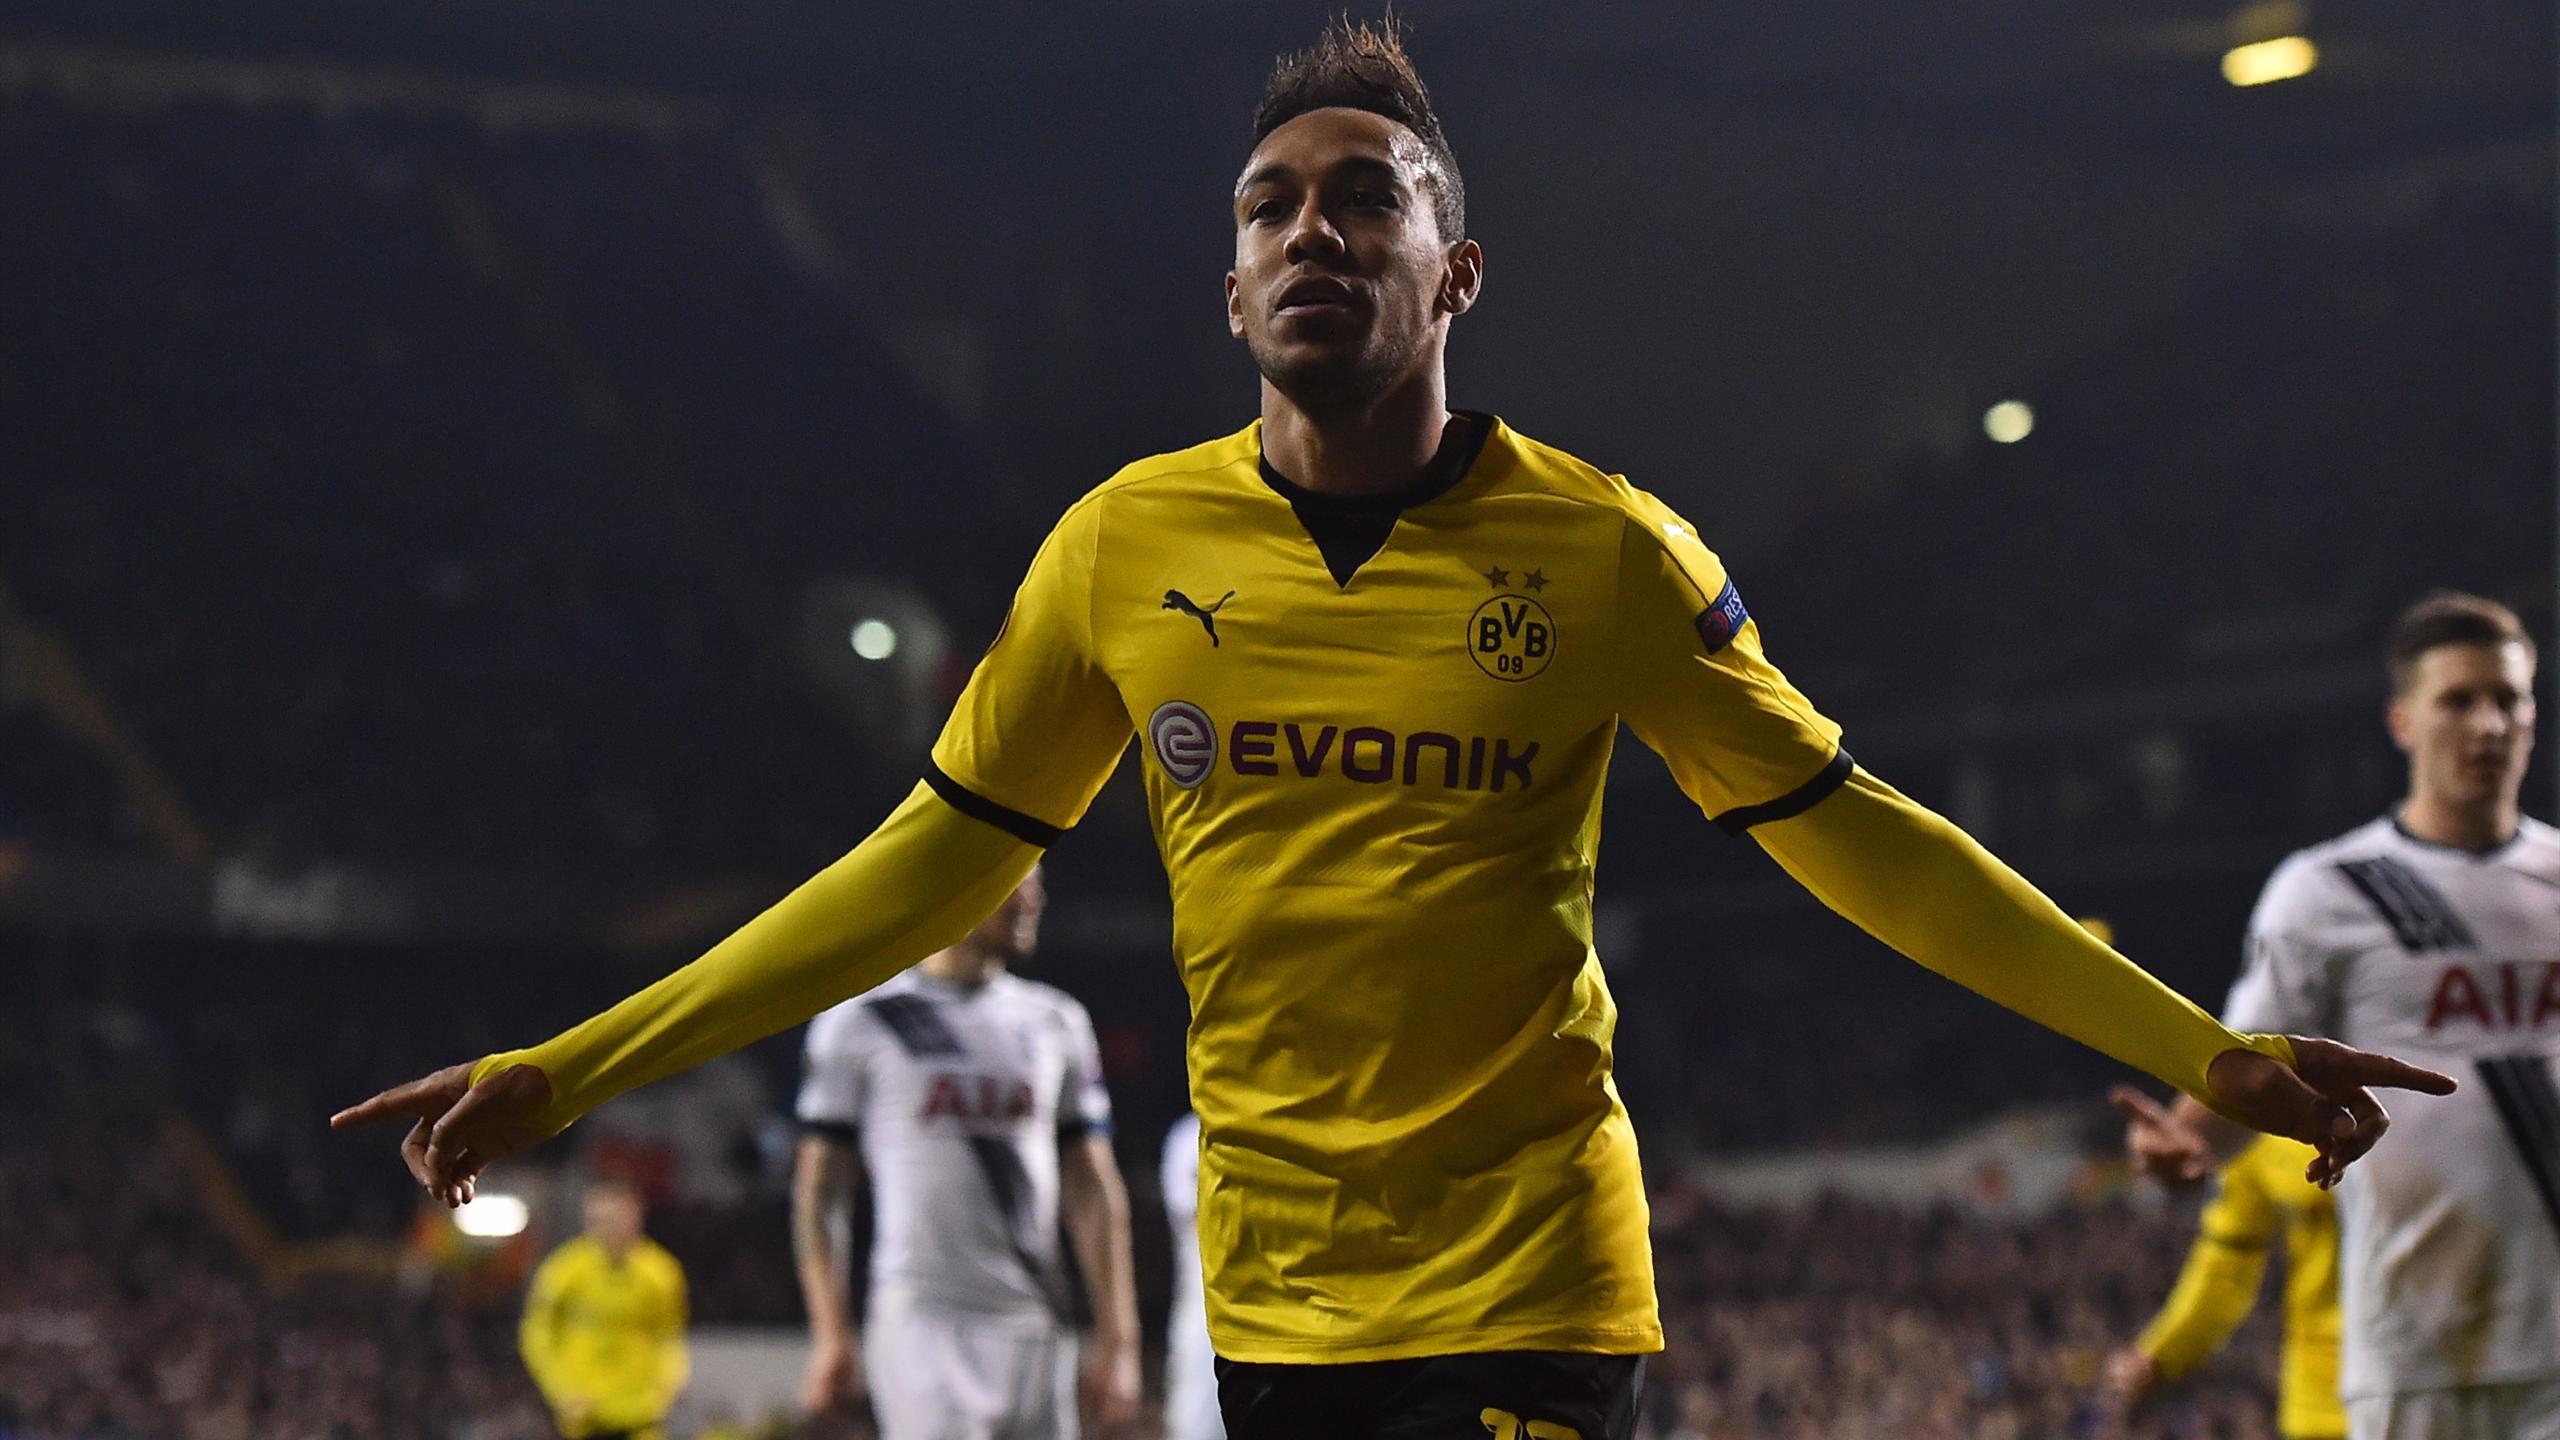 Borussia Dortmund's Gabonese striker Pierre-Emerick Aubameyang celebrates